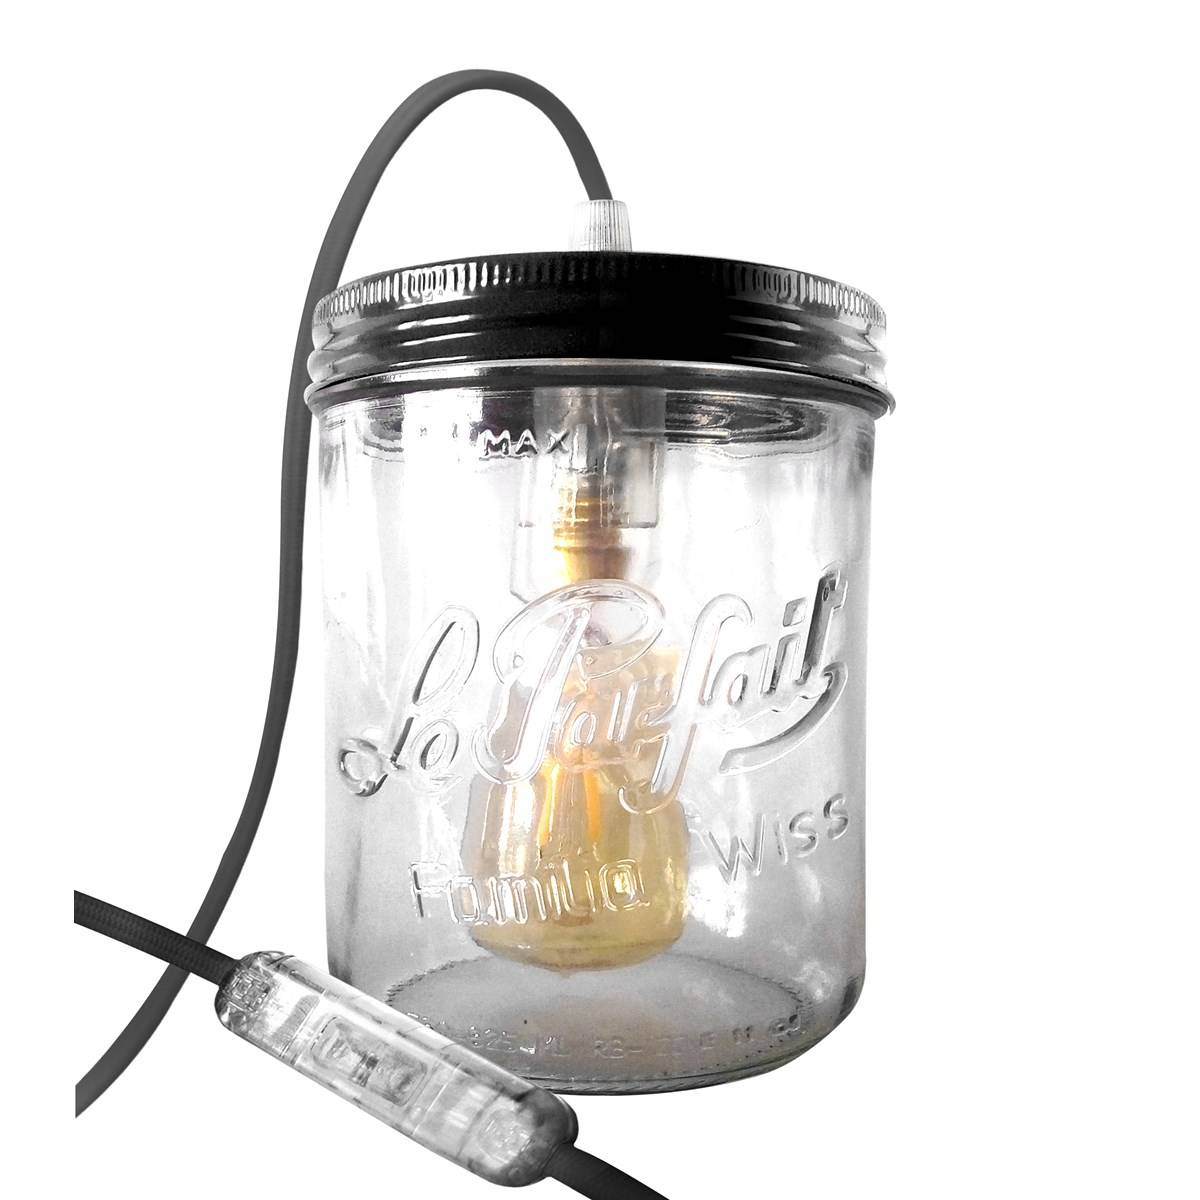 Fenel & Arno Lampe bocal en verre noir